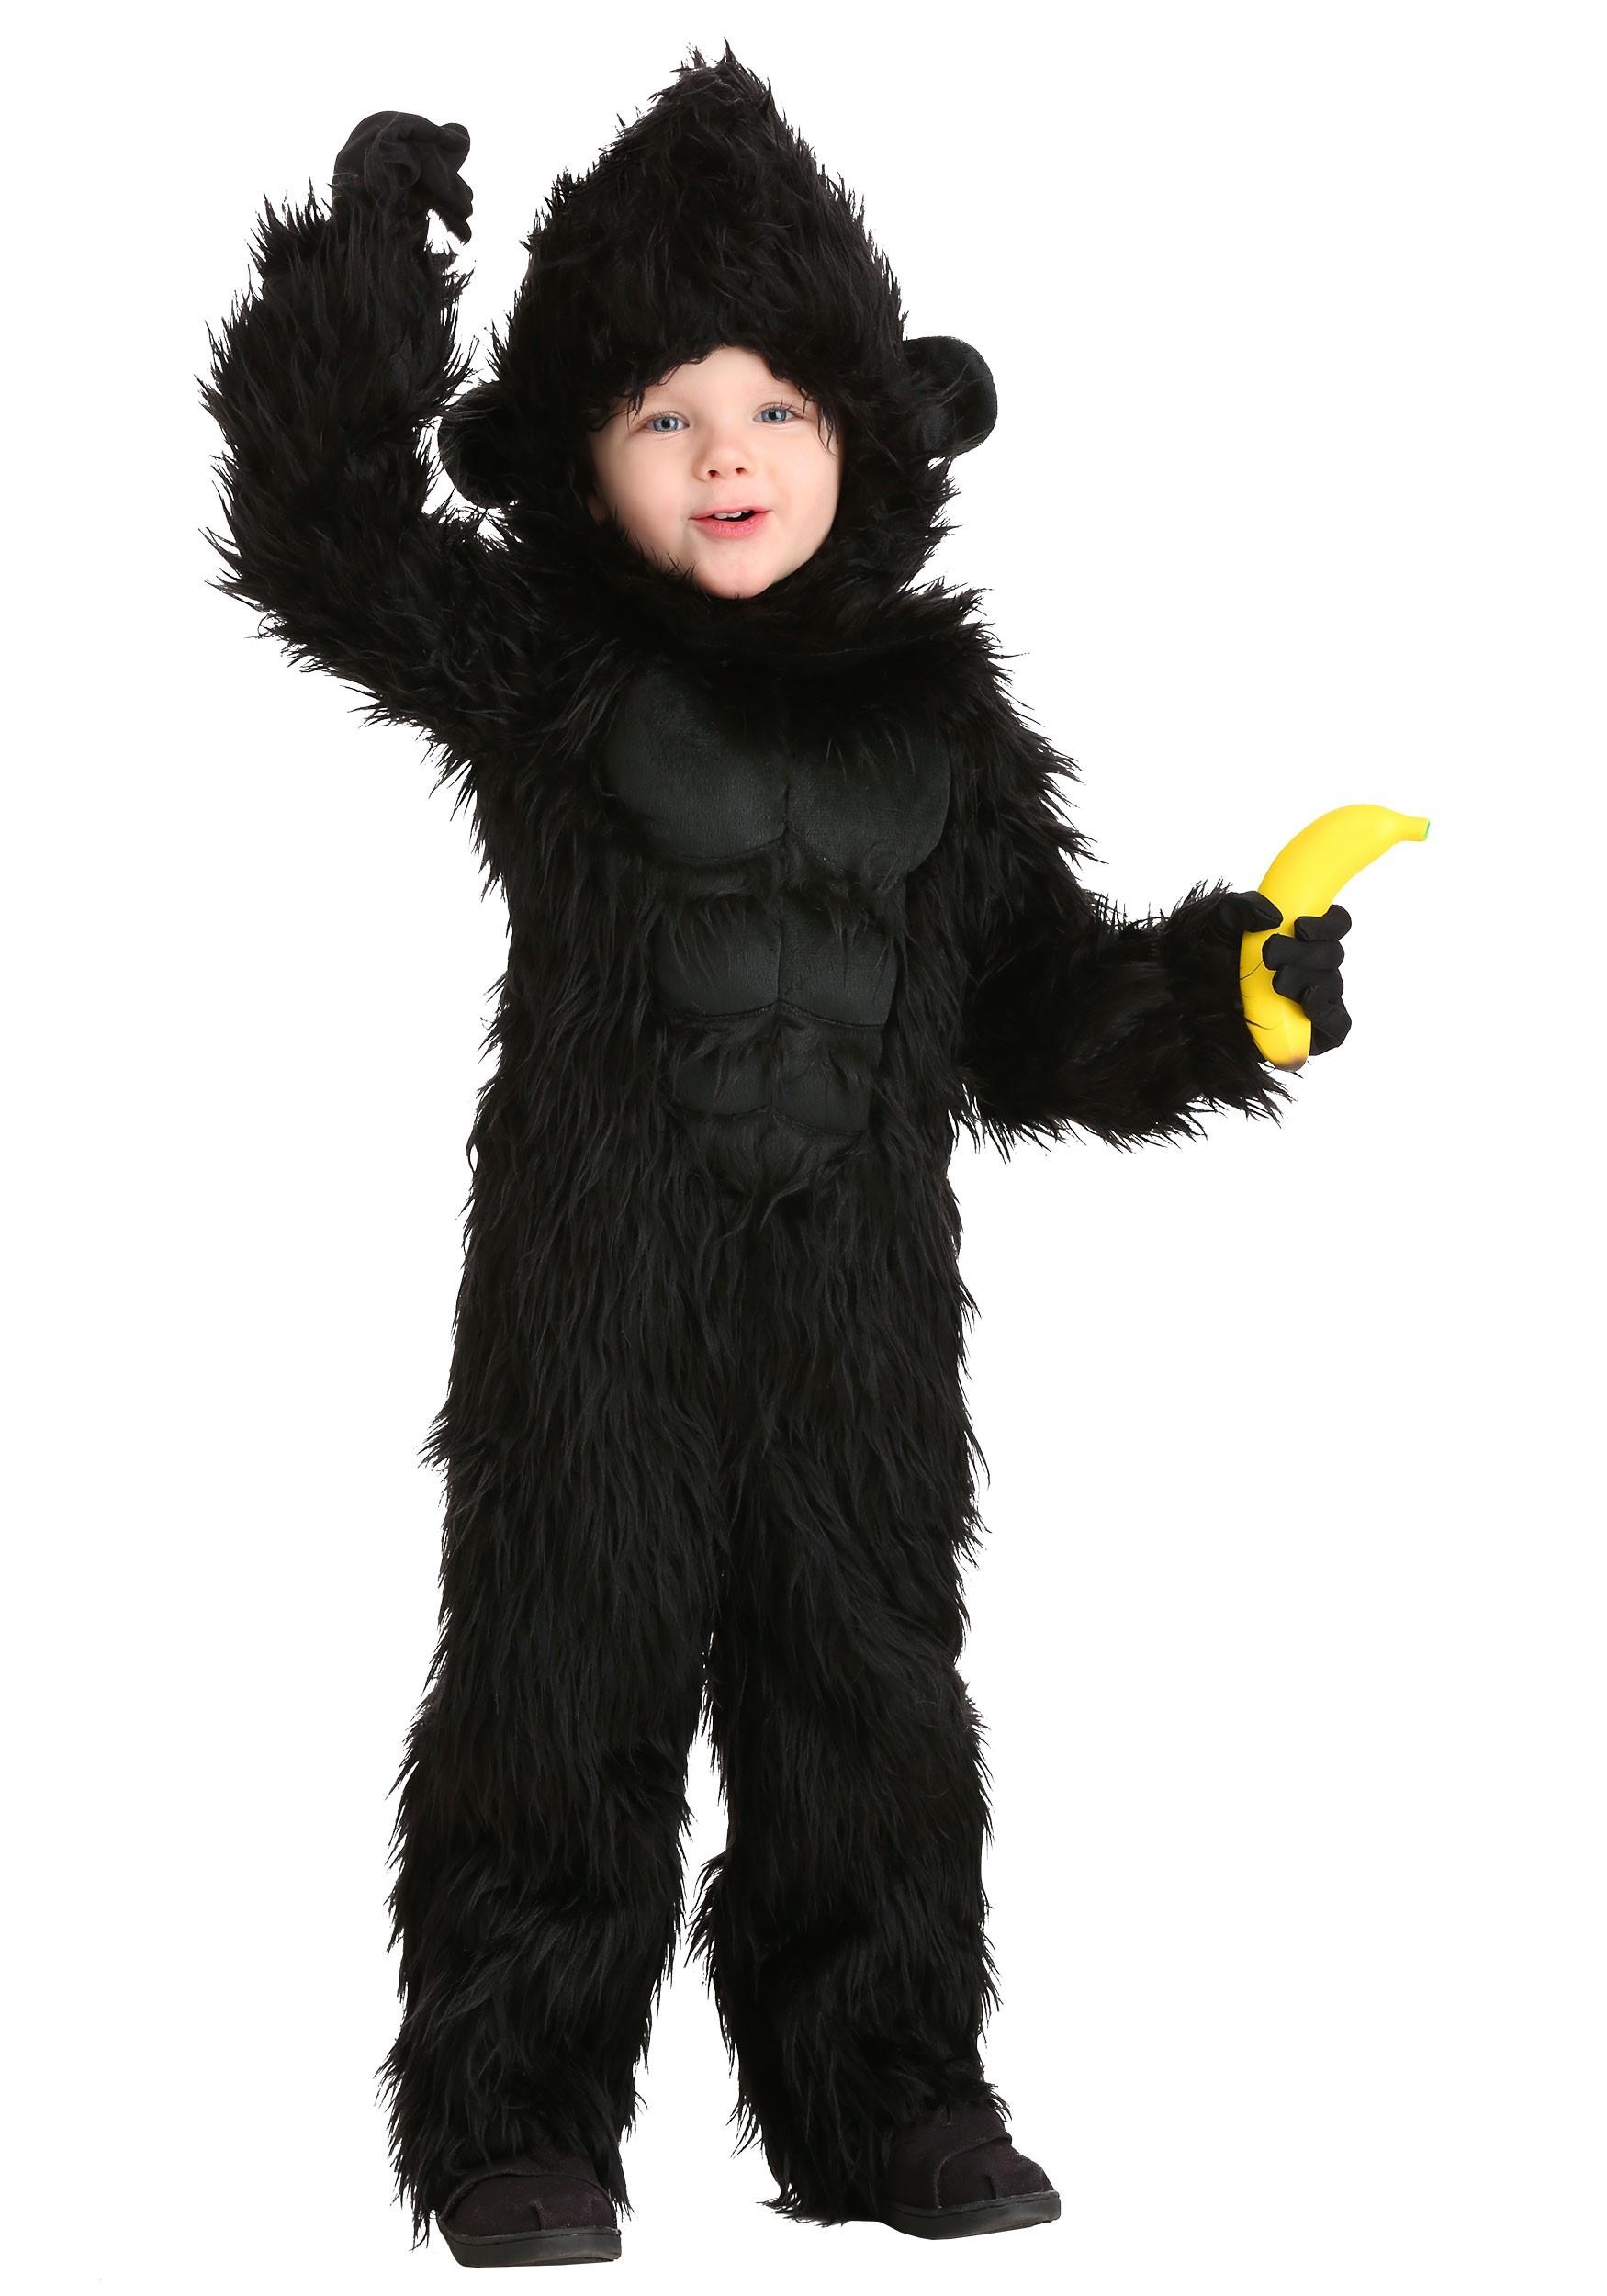 Little Kids Plush Gorilla Costume By Dress up America